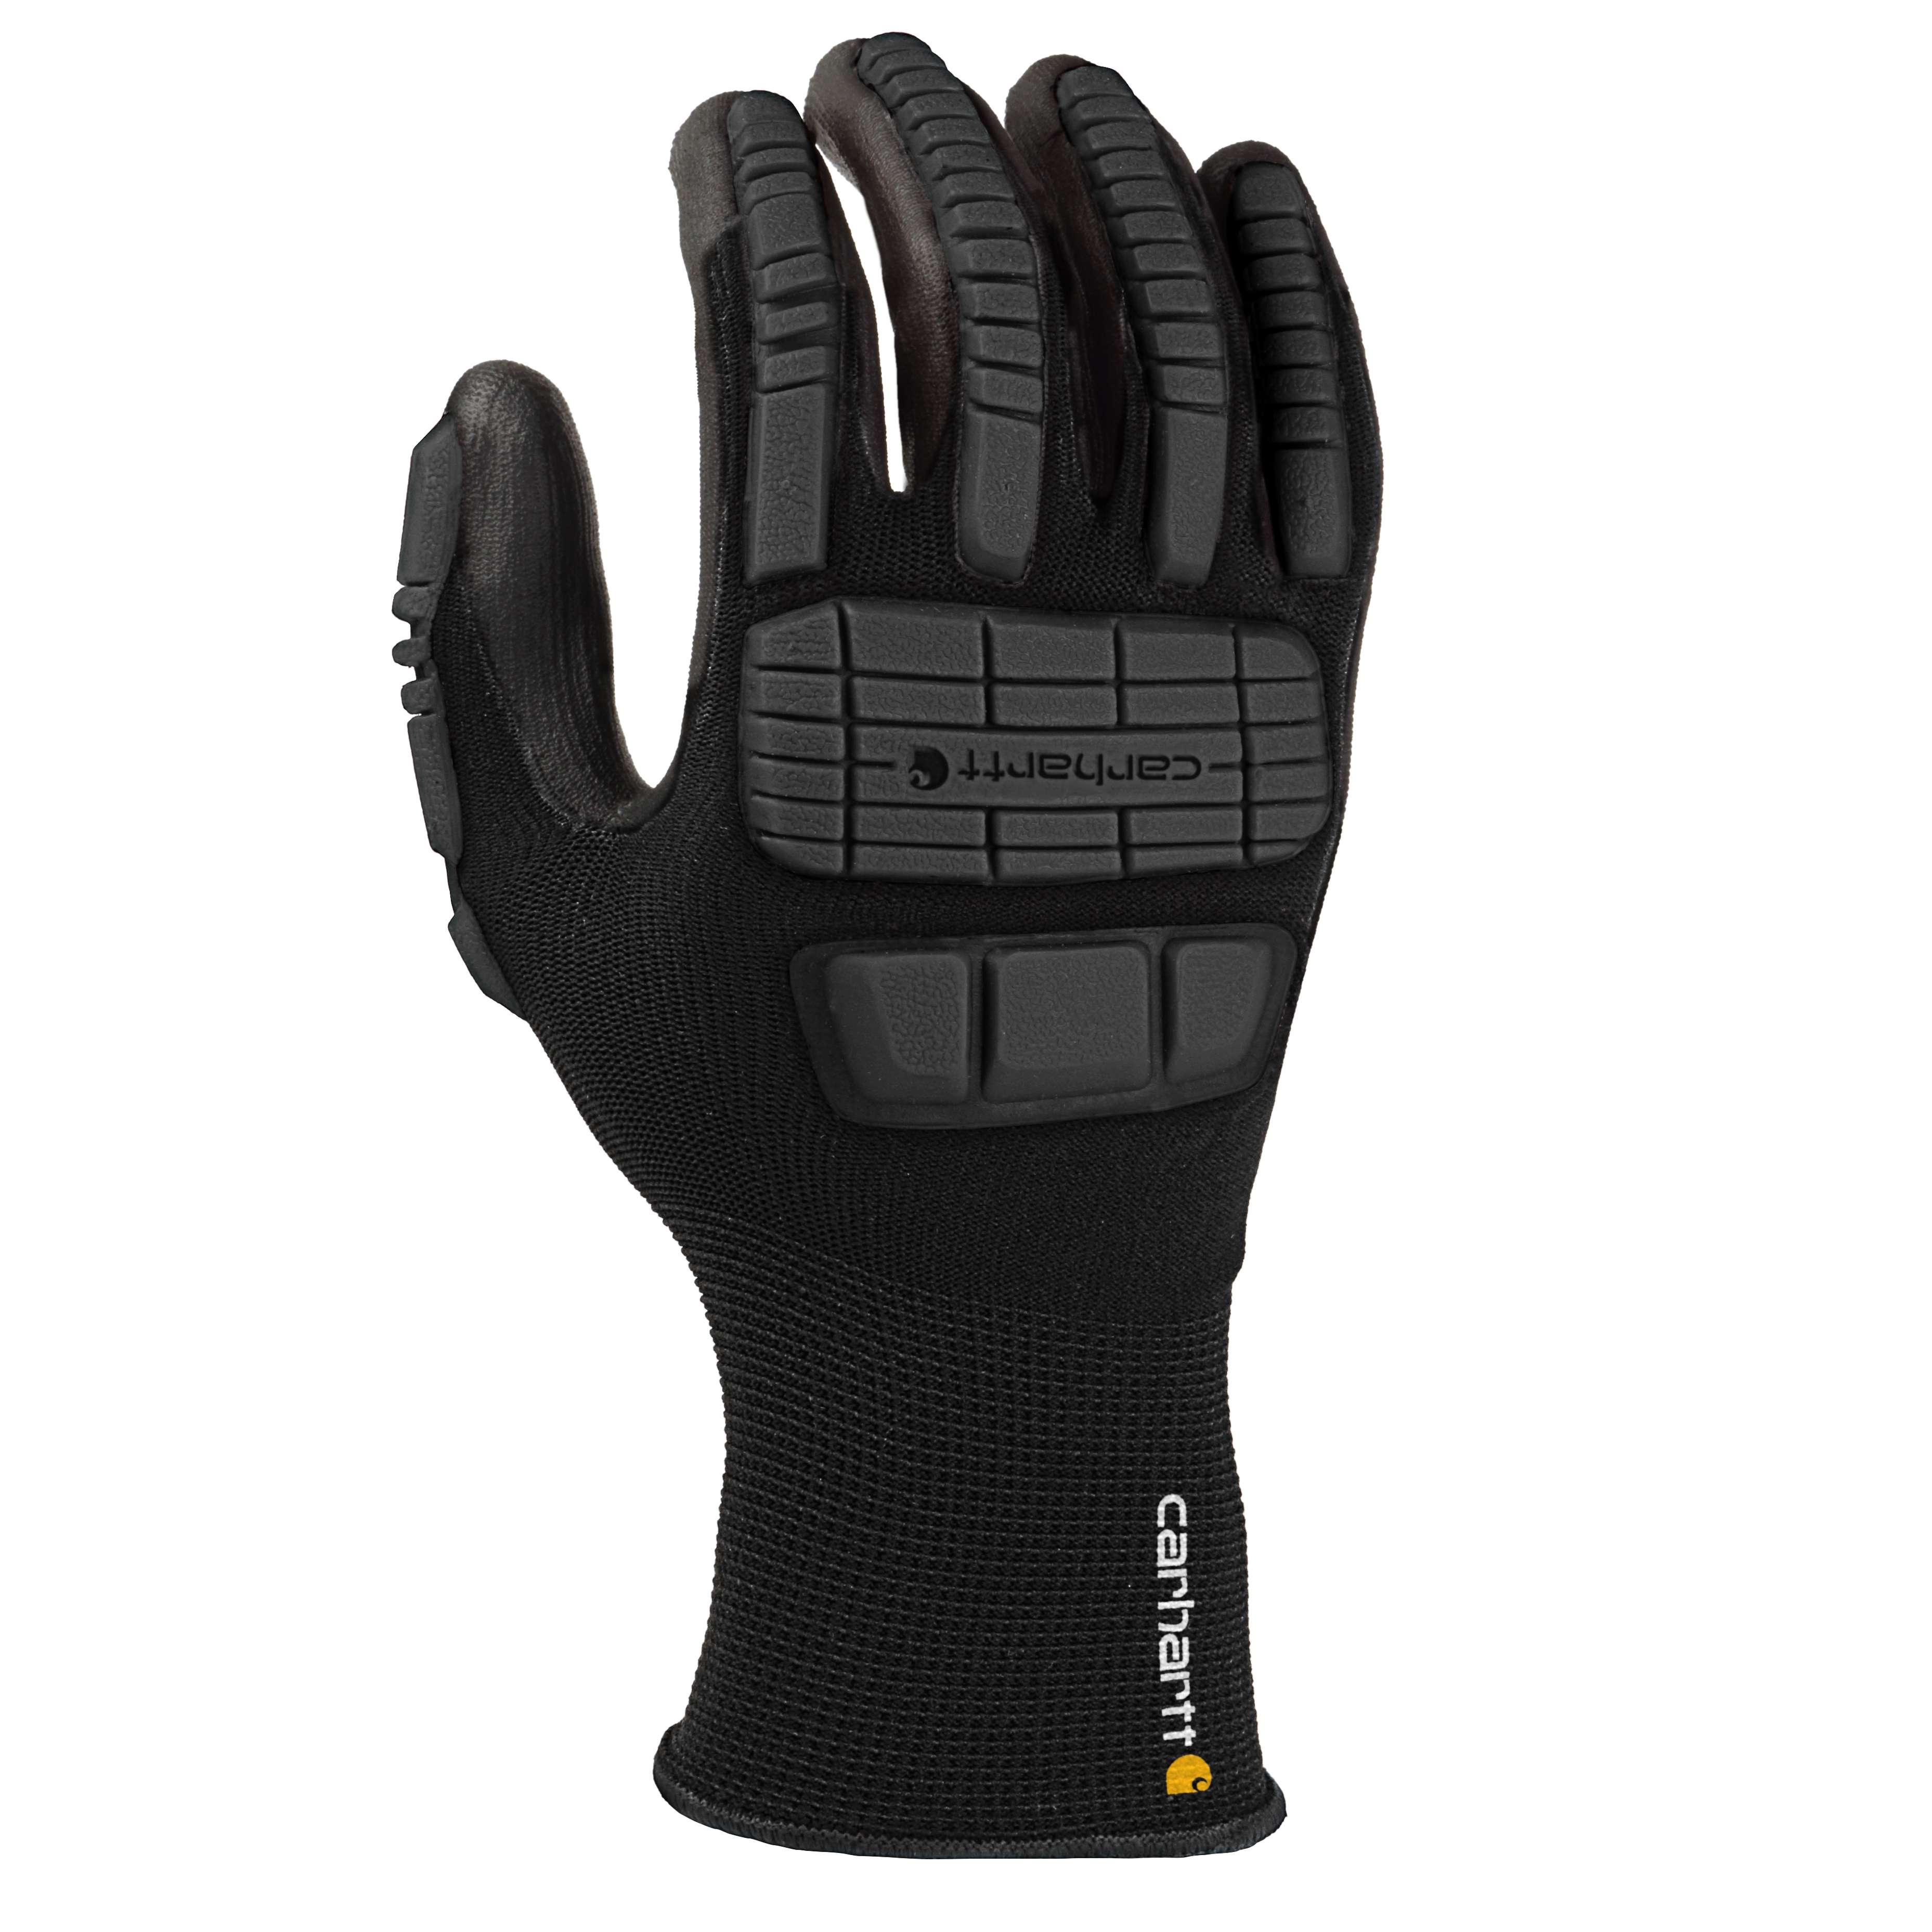 Carhartt Impact Hybrid C-Grip Glove